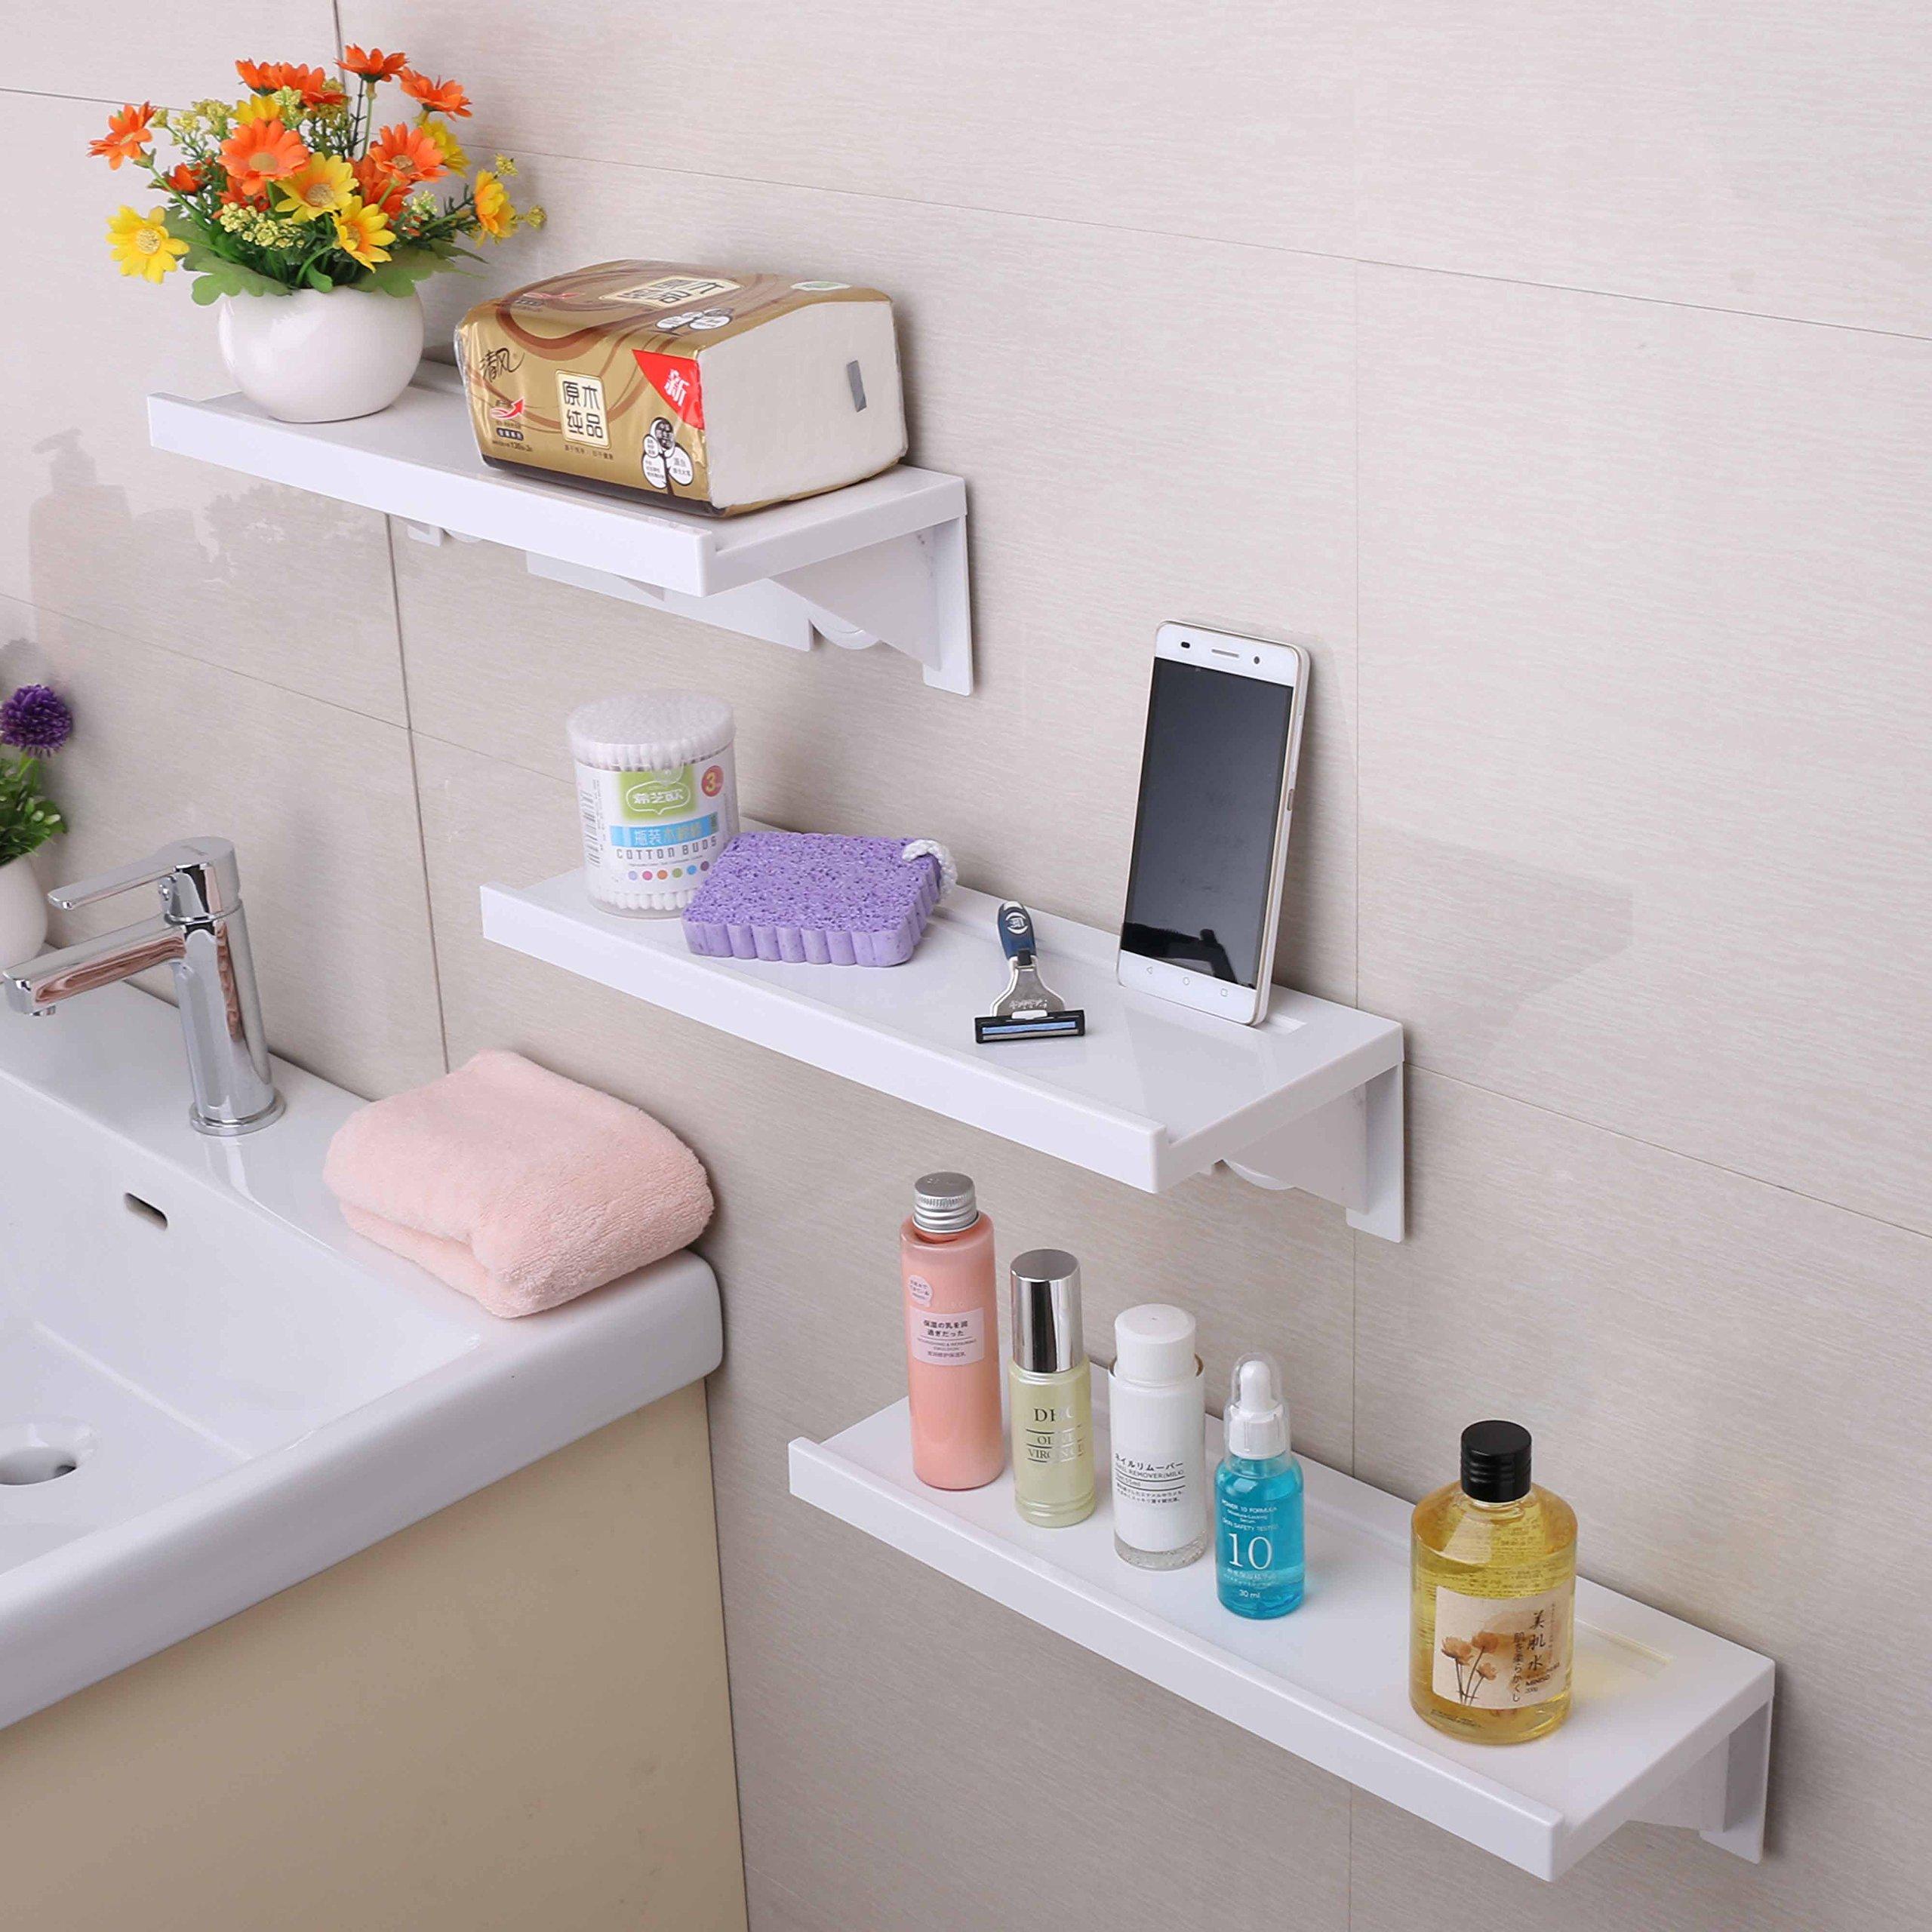 Easy & Eco Life Suction Cup Floating Shelf Bathroom Shower Rack ...